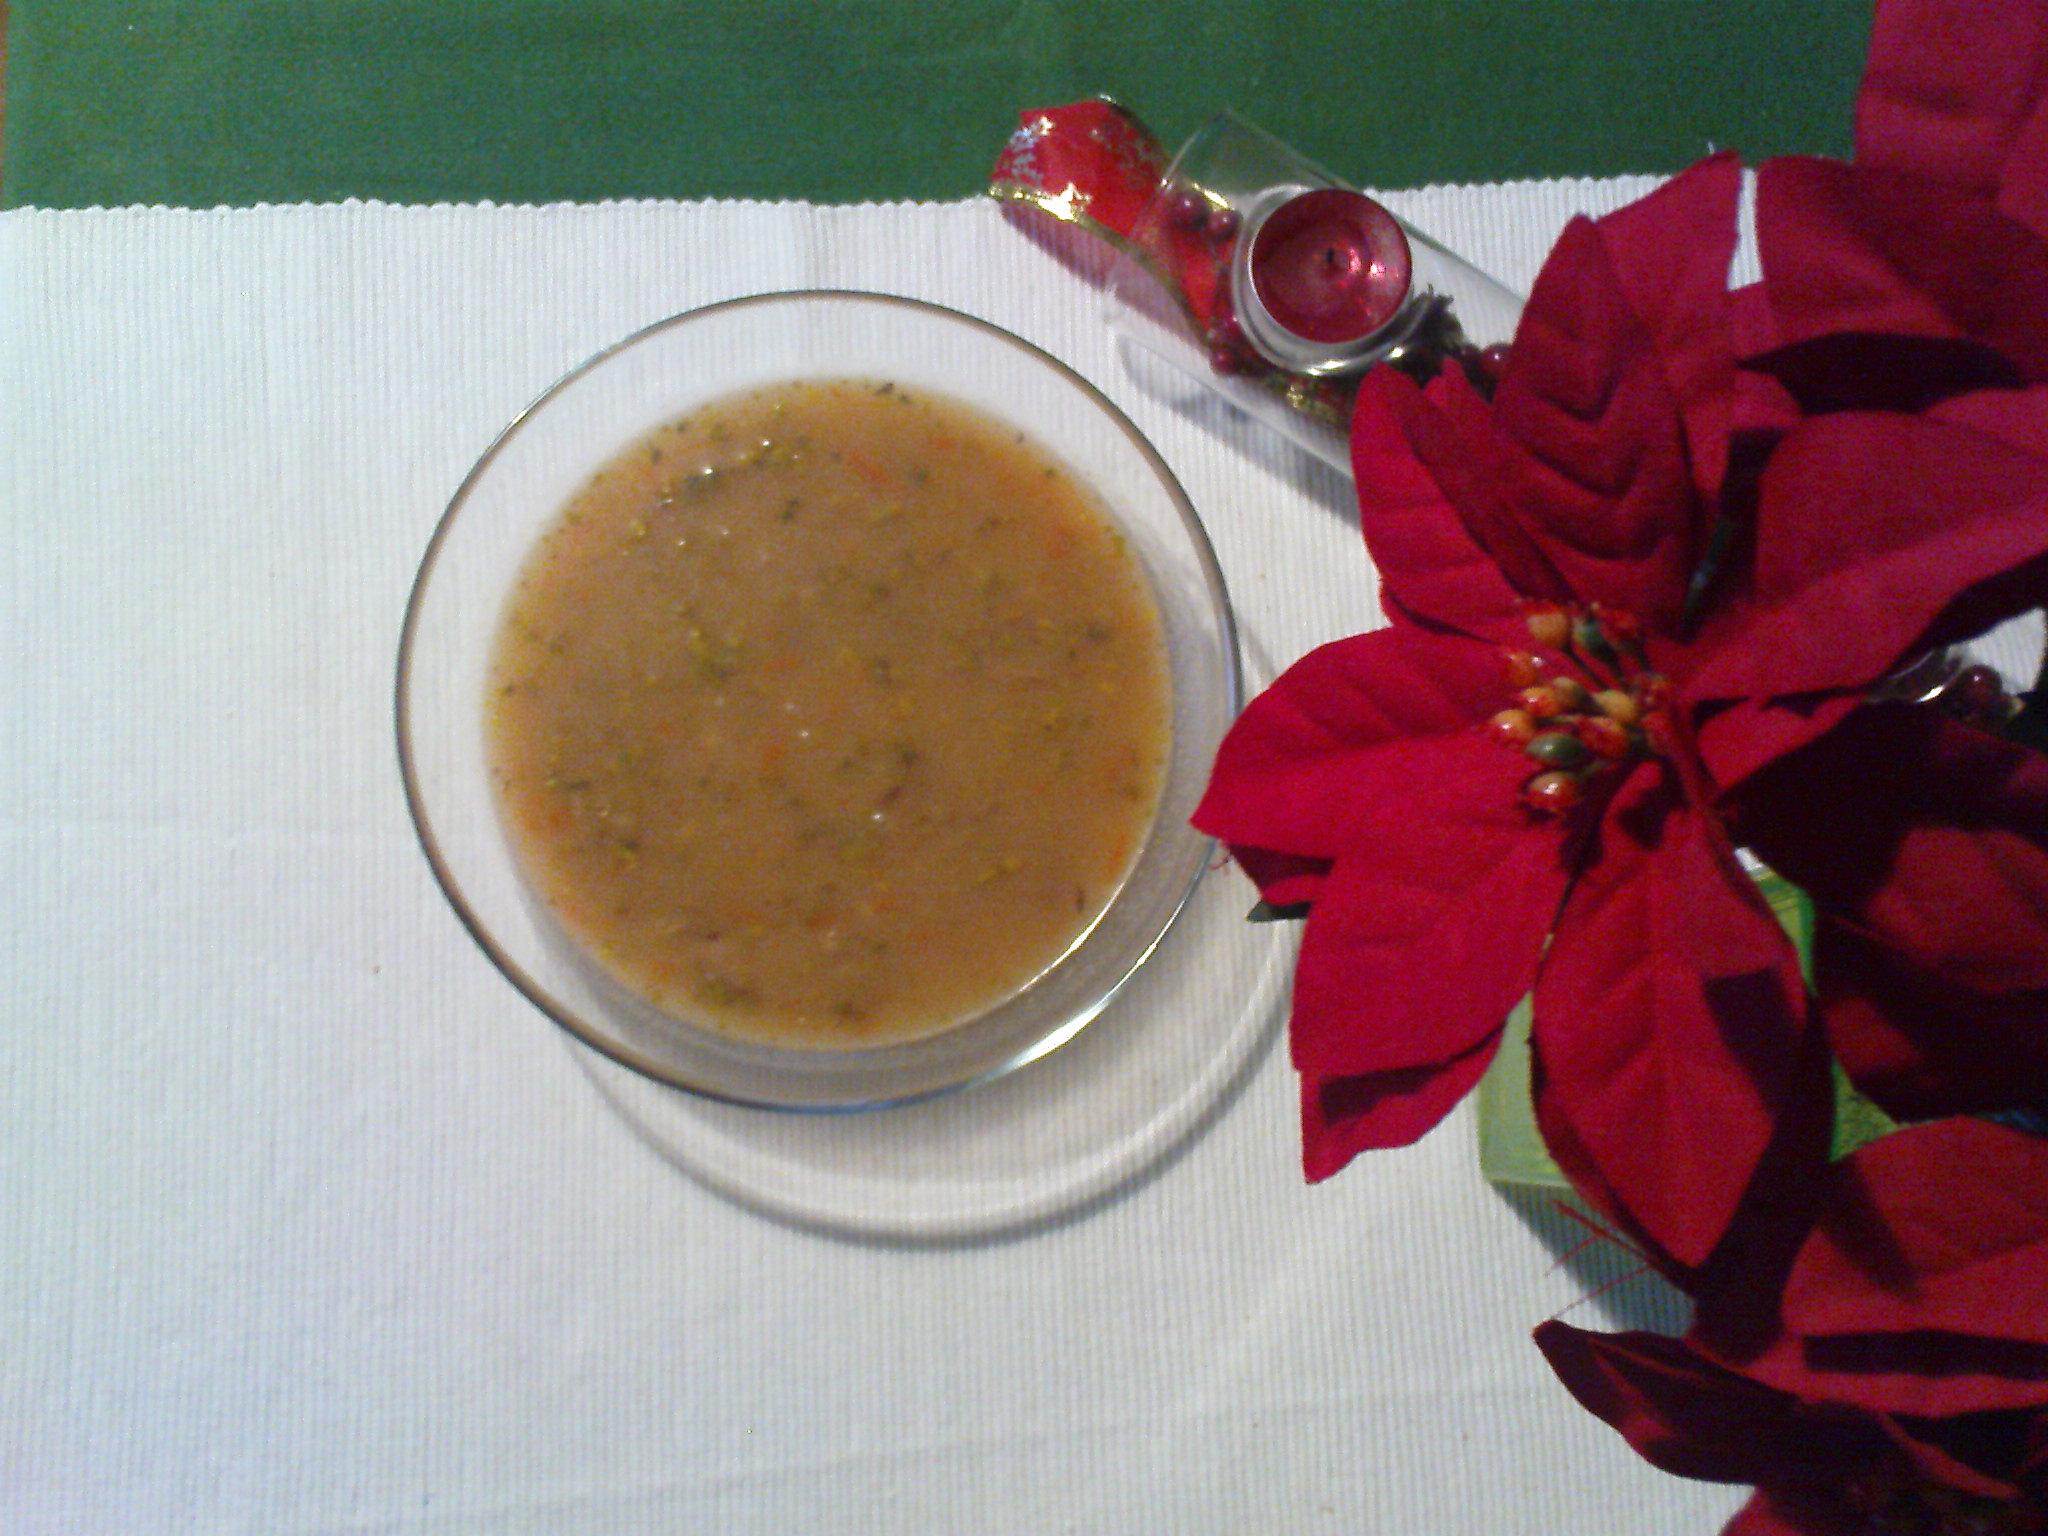 Recept Čočková polévka - Hotová čočková polévka - dobrou chuť.